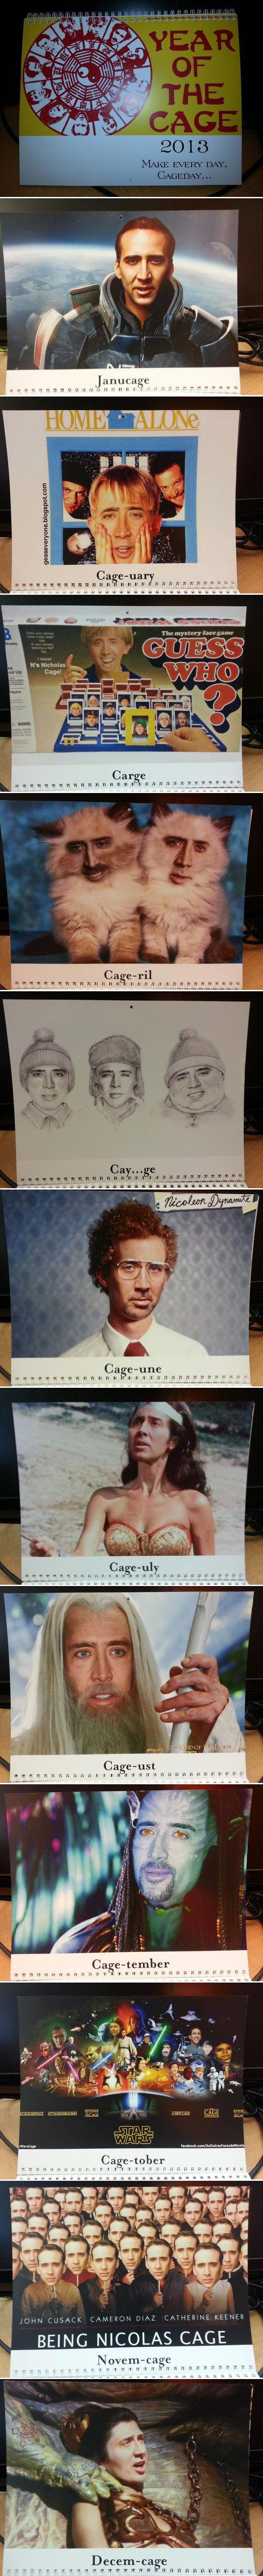 Cagetastic. . JOHN CUSACK CAMERON Di/\ Z ( KEENER, BEING NICOLAS CAGE